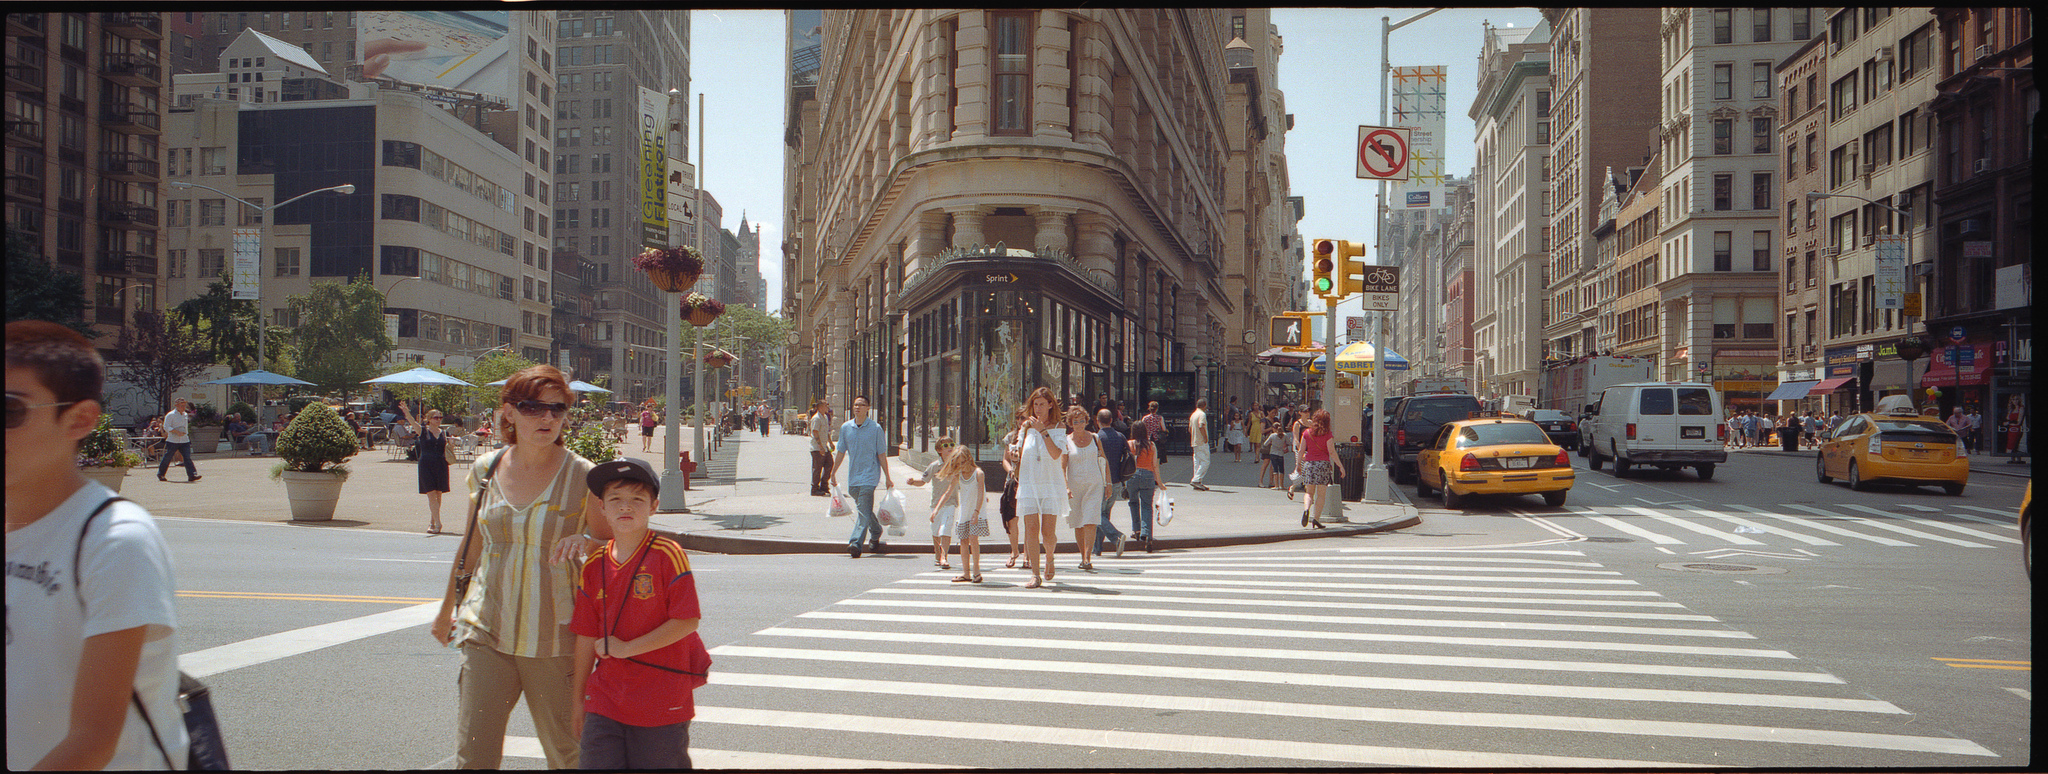 Перекресток перед Флэтайрон-билдинг, Нью-Йорк